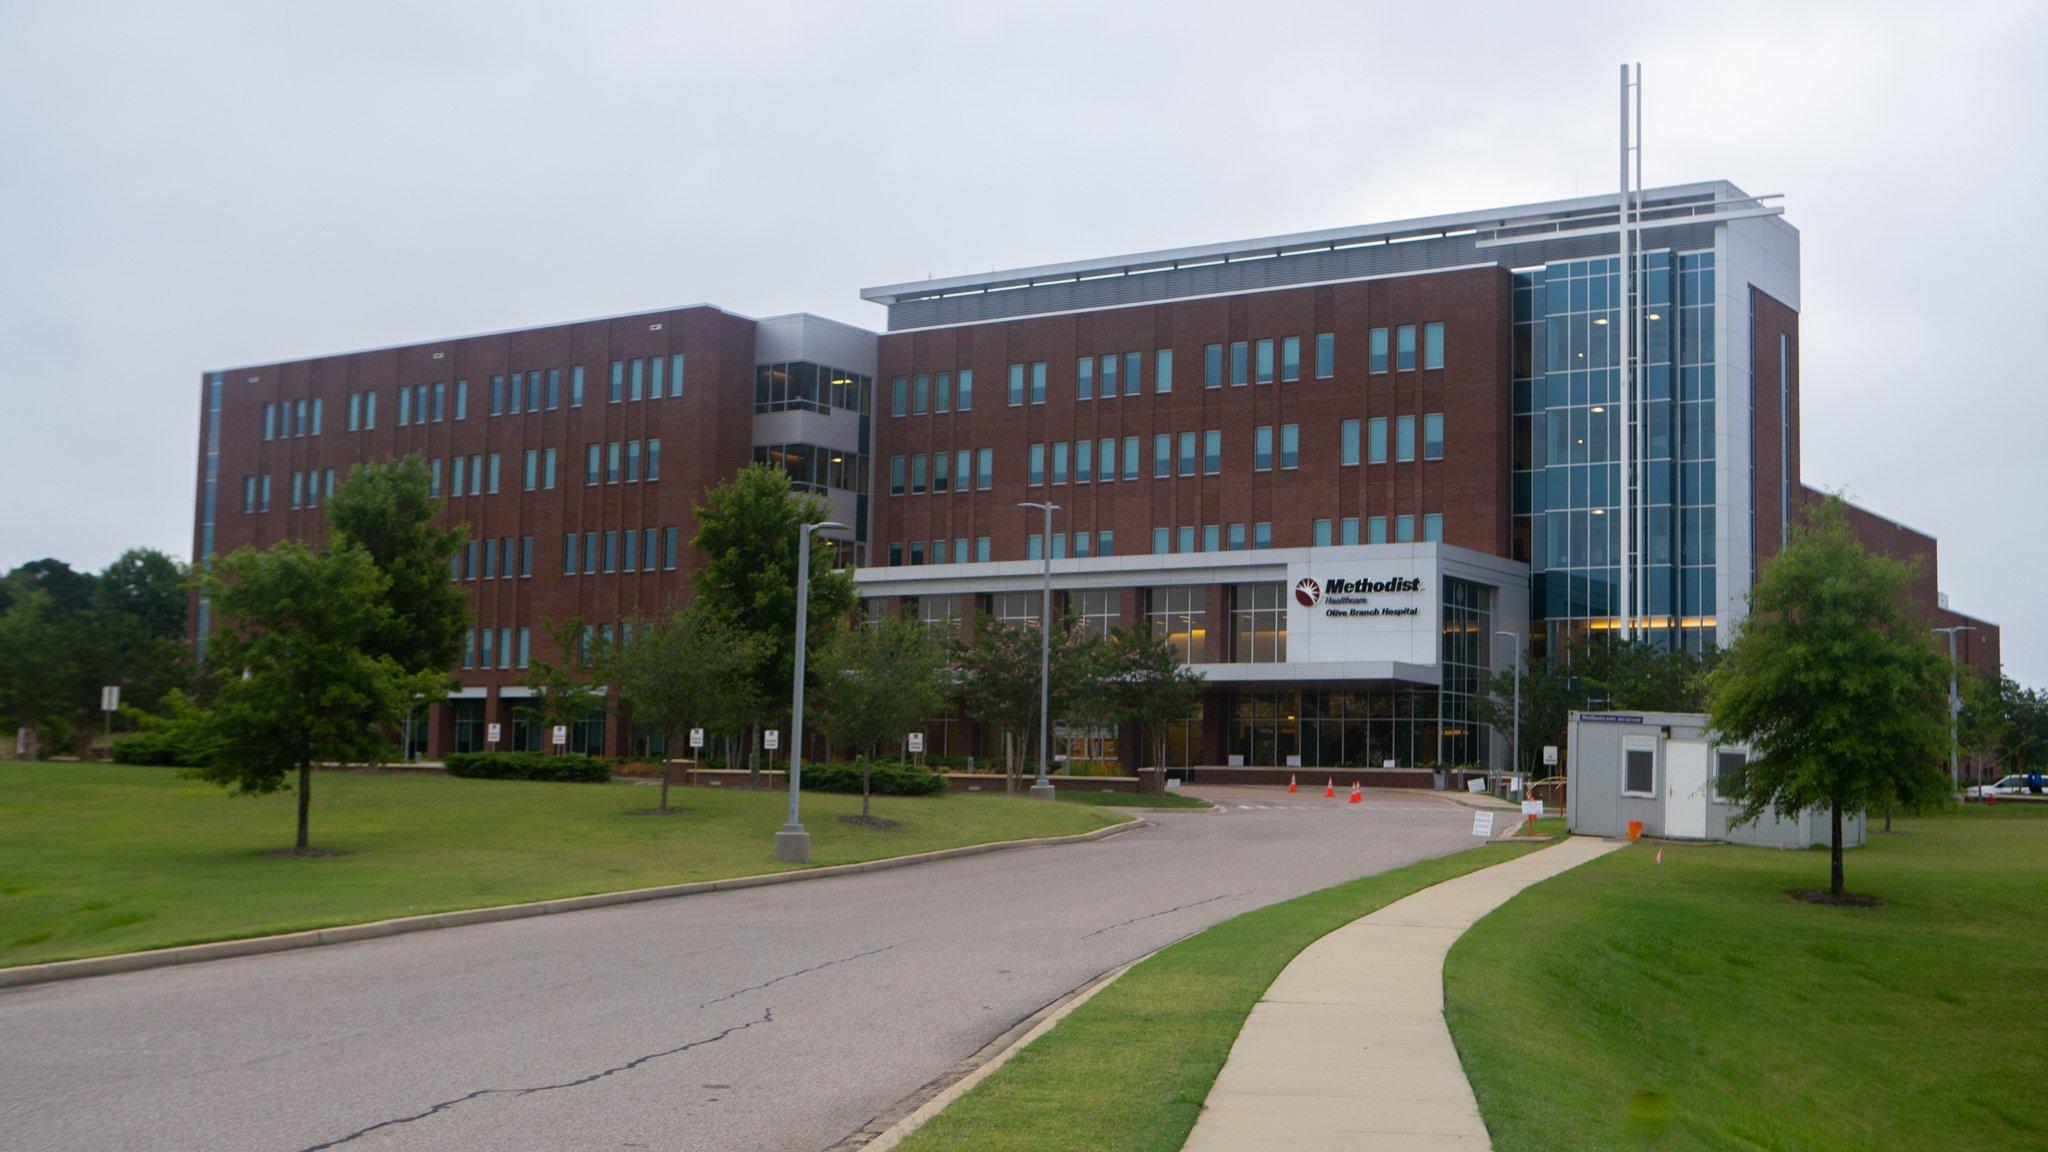 Methodist Hospital  landscaping